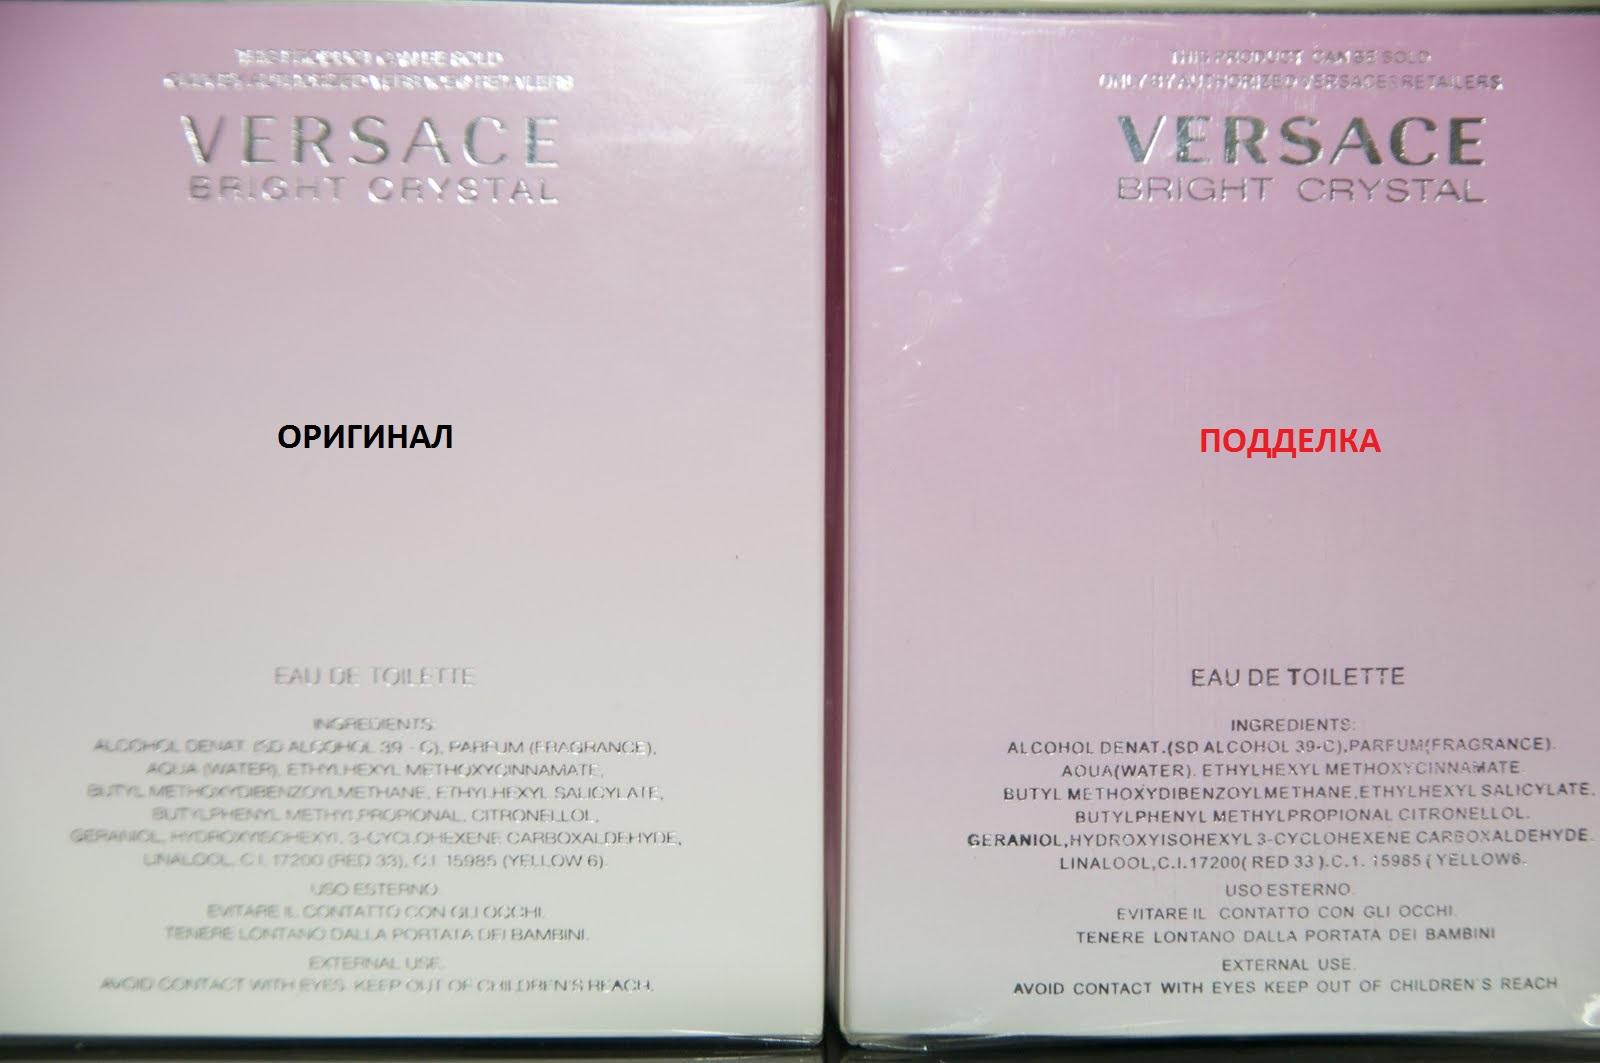 Versace Bright Crystal 90 ml  оригинал против подделки (Фото) 58fbe5c609e5d